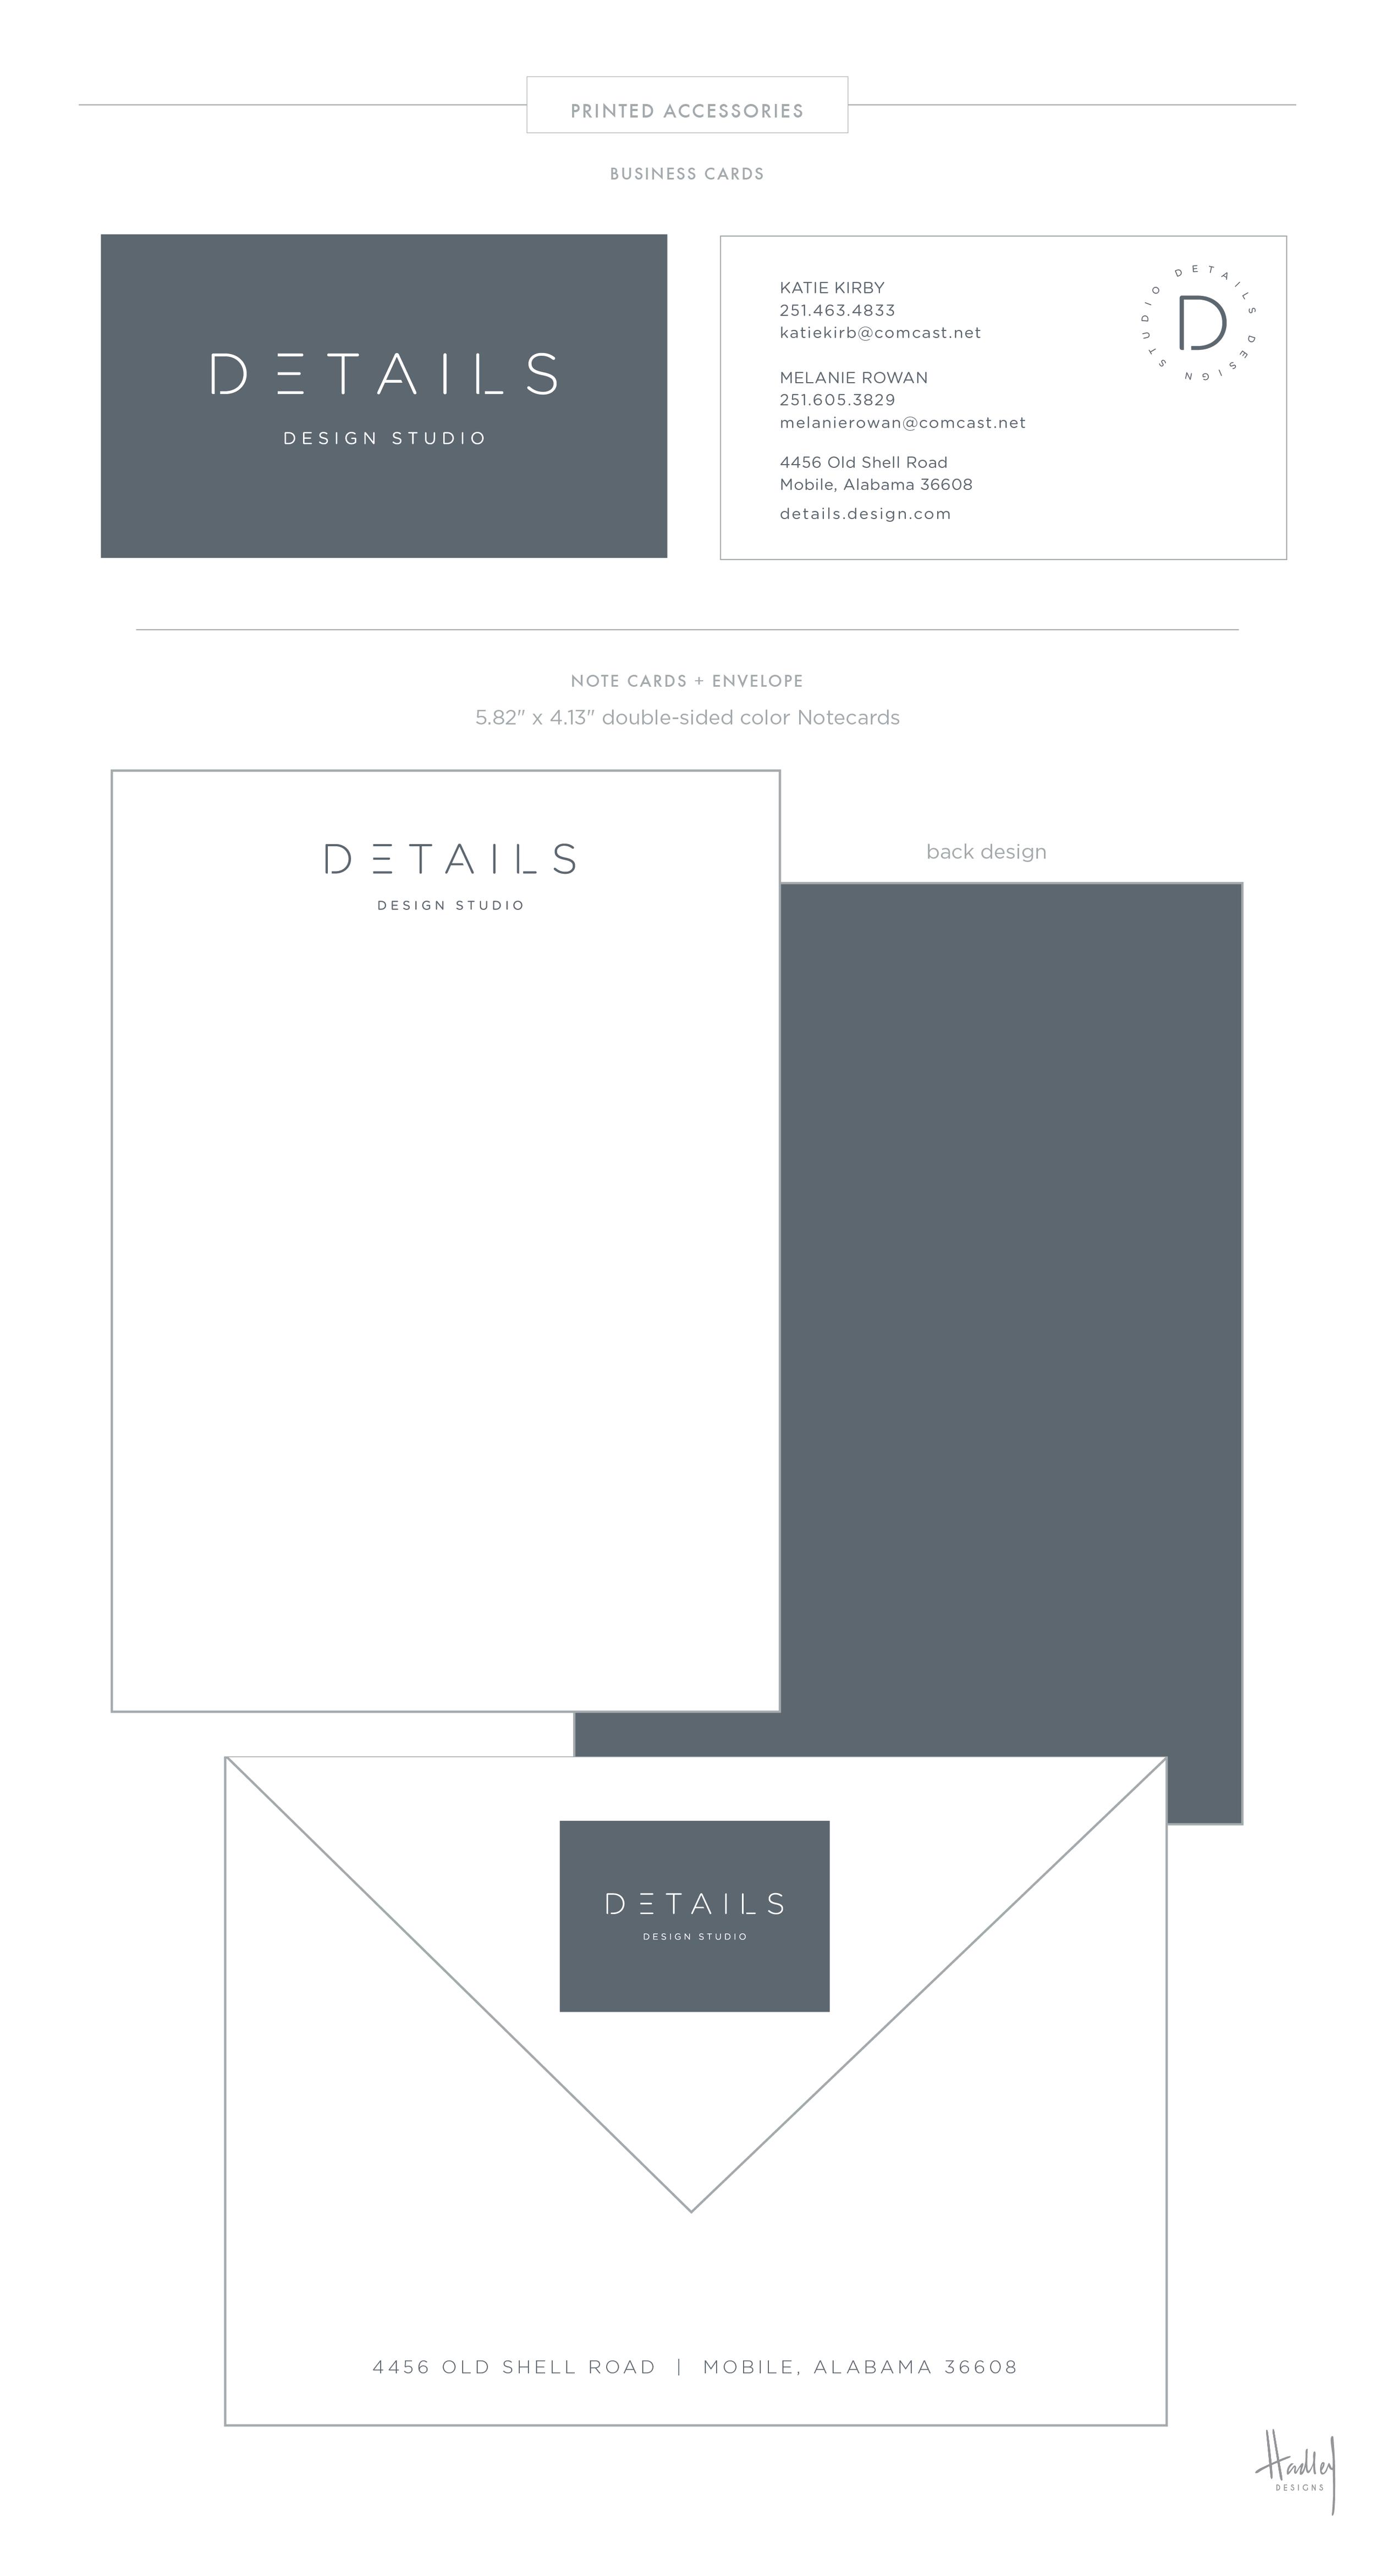 Details_Stationery.png